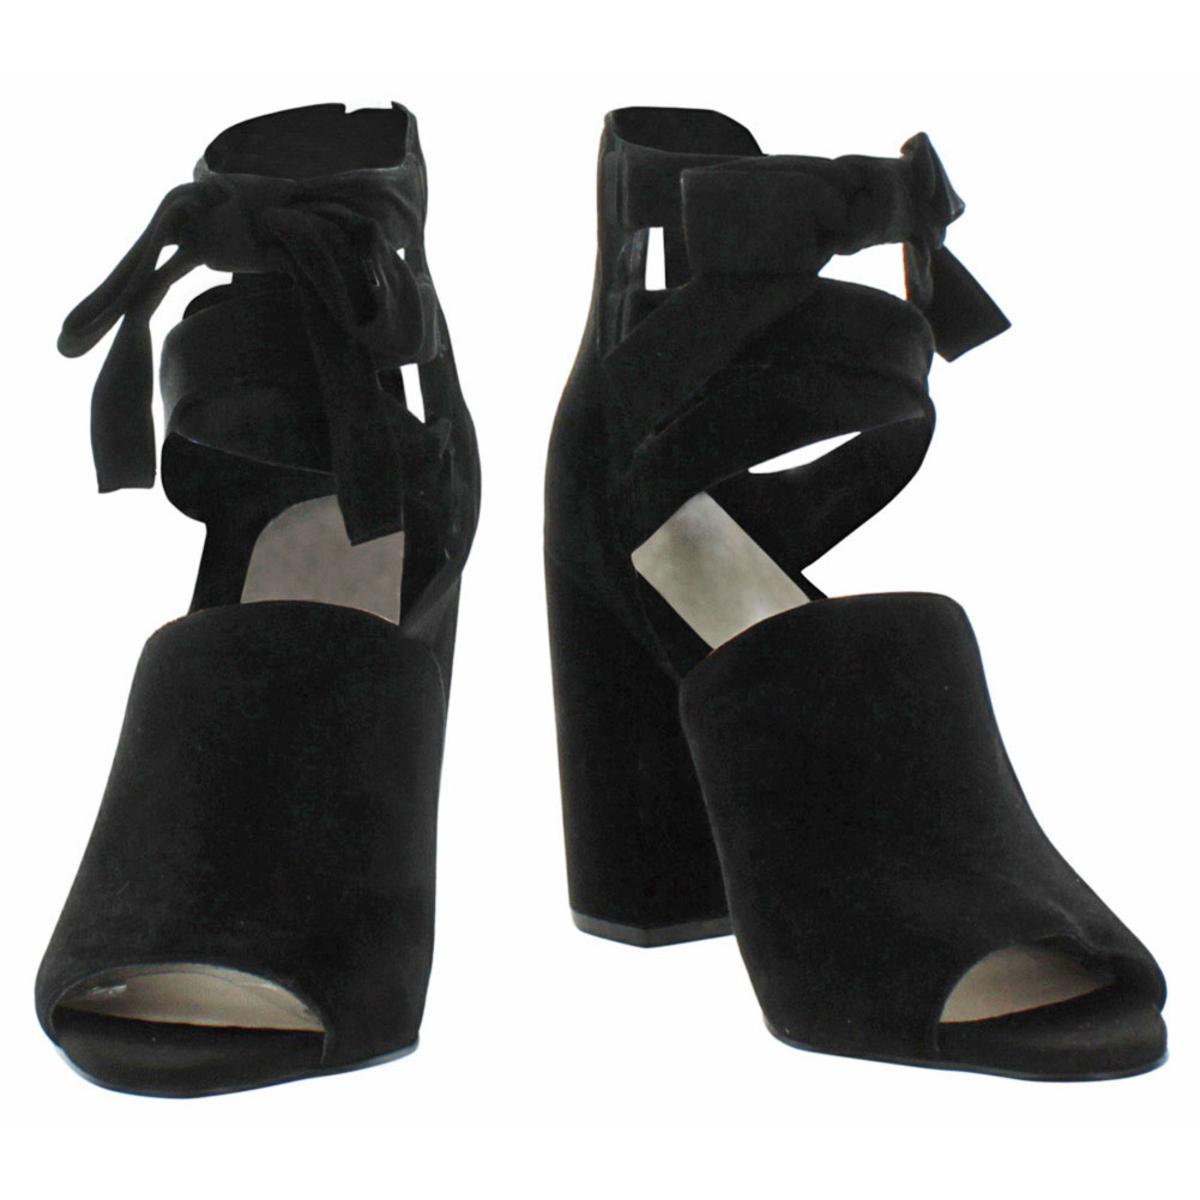 Jessica-Simpson-Kandiss-Women-039-s-Open-Toe-Block-Heel-Dress-Shoes thumbnail 6